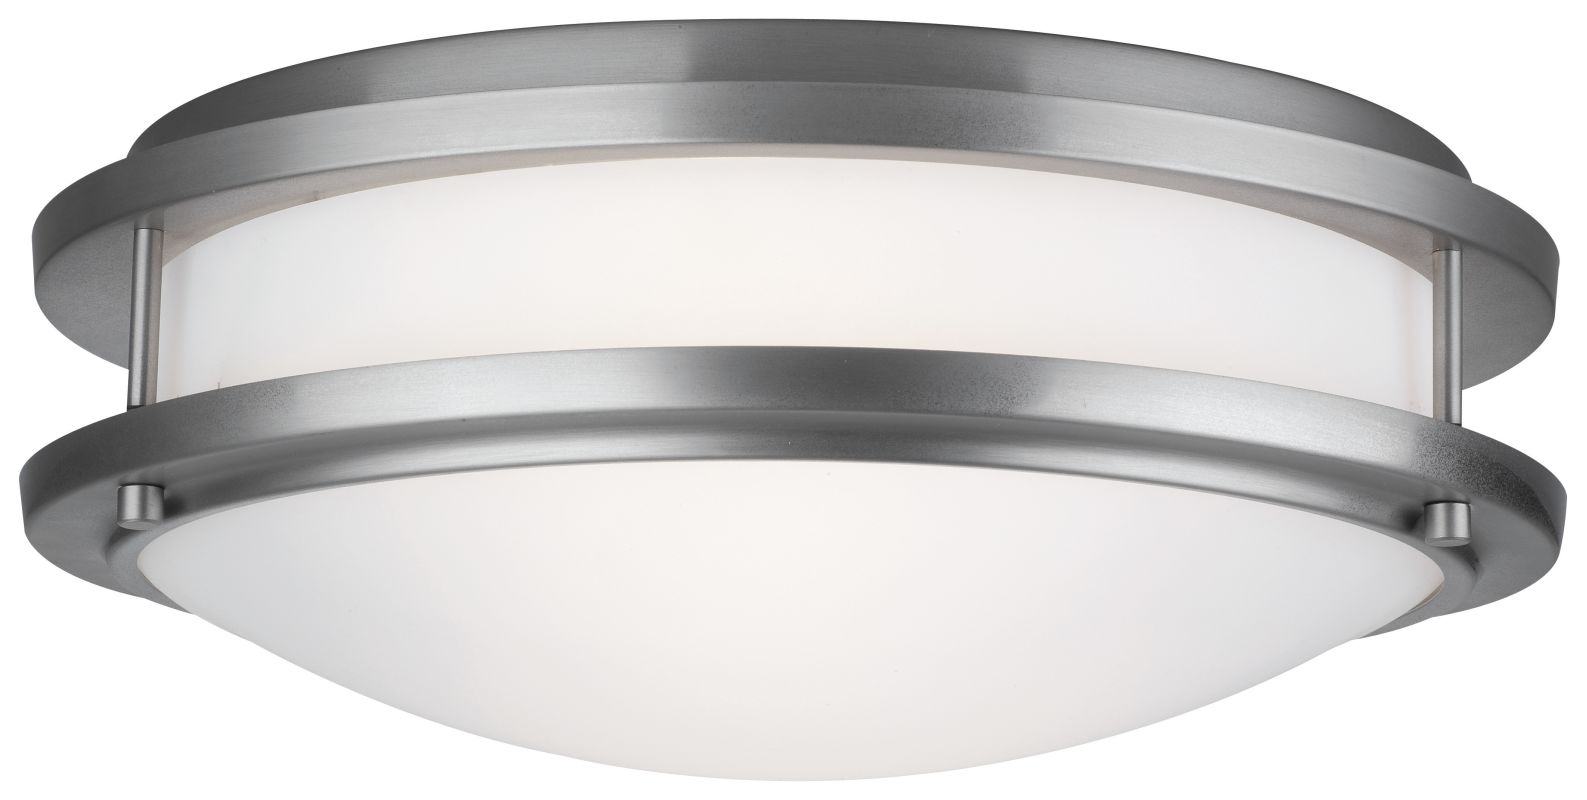 Forecast Lighting F245636U Satin Nickel 2 Light 1375